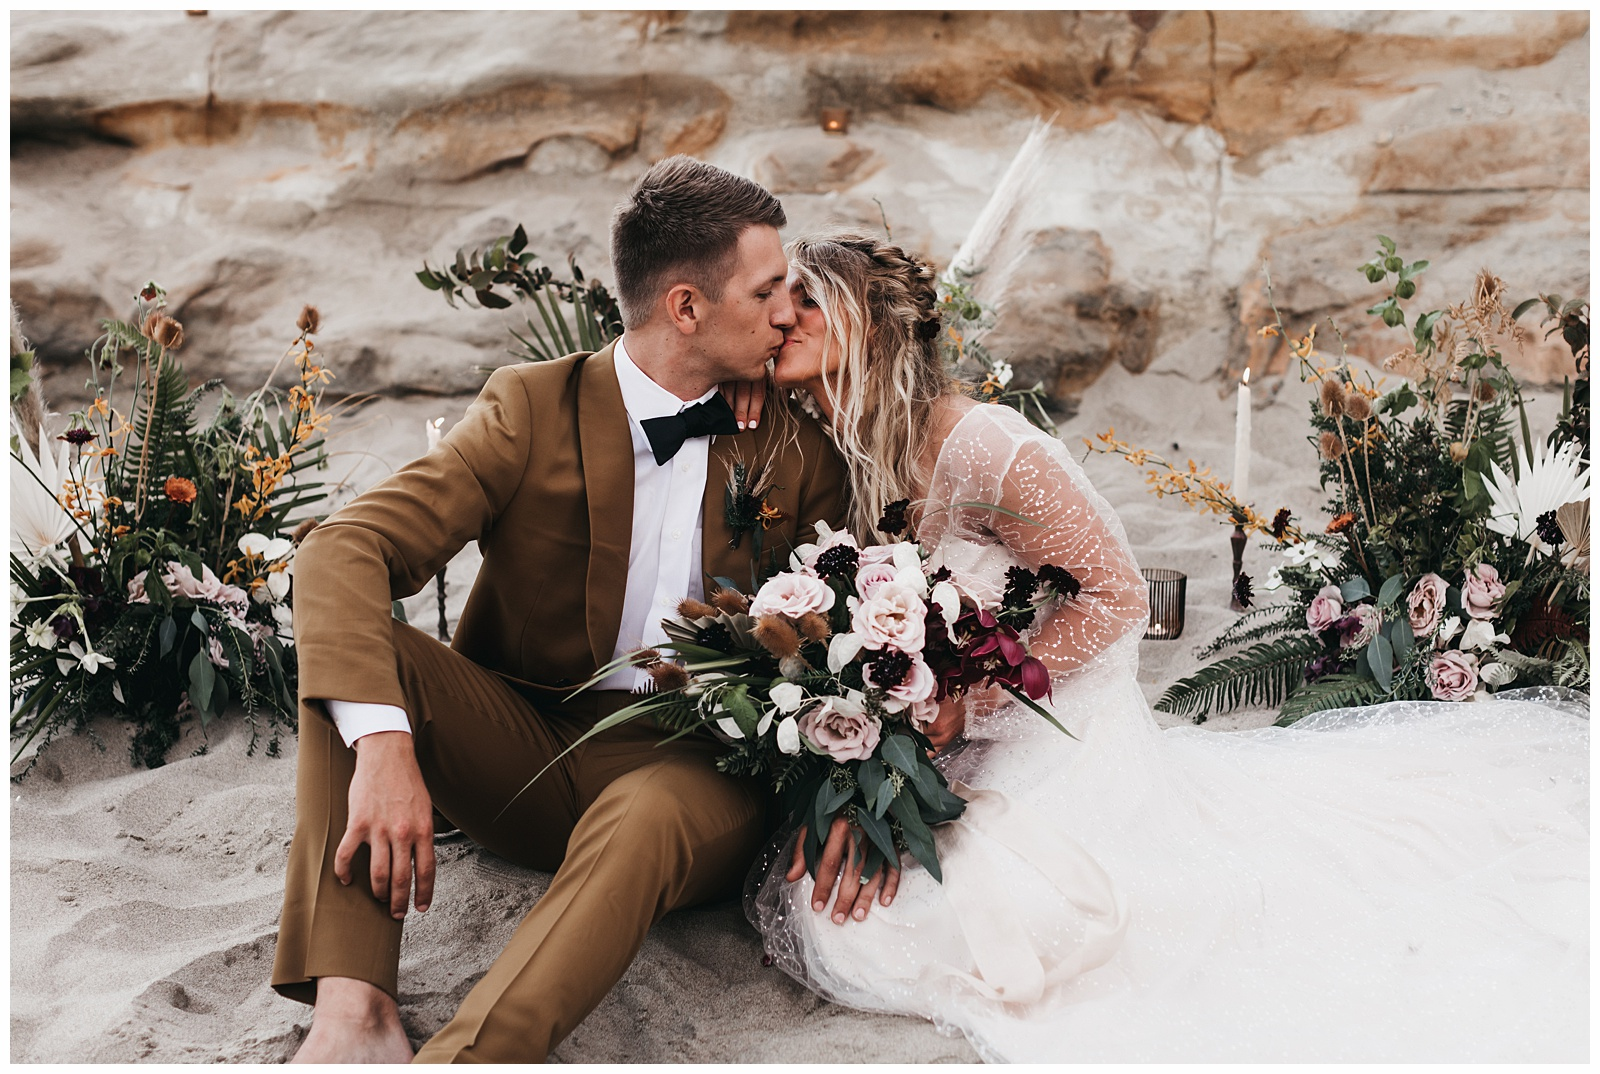 portland-wedding-photographer-pacific-city-elopement-photographer-anniezav_0038.jpg